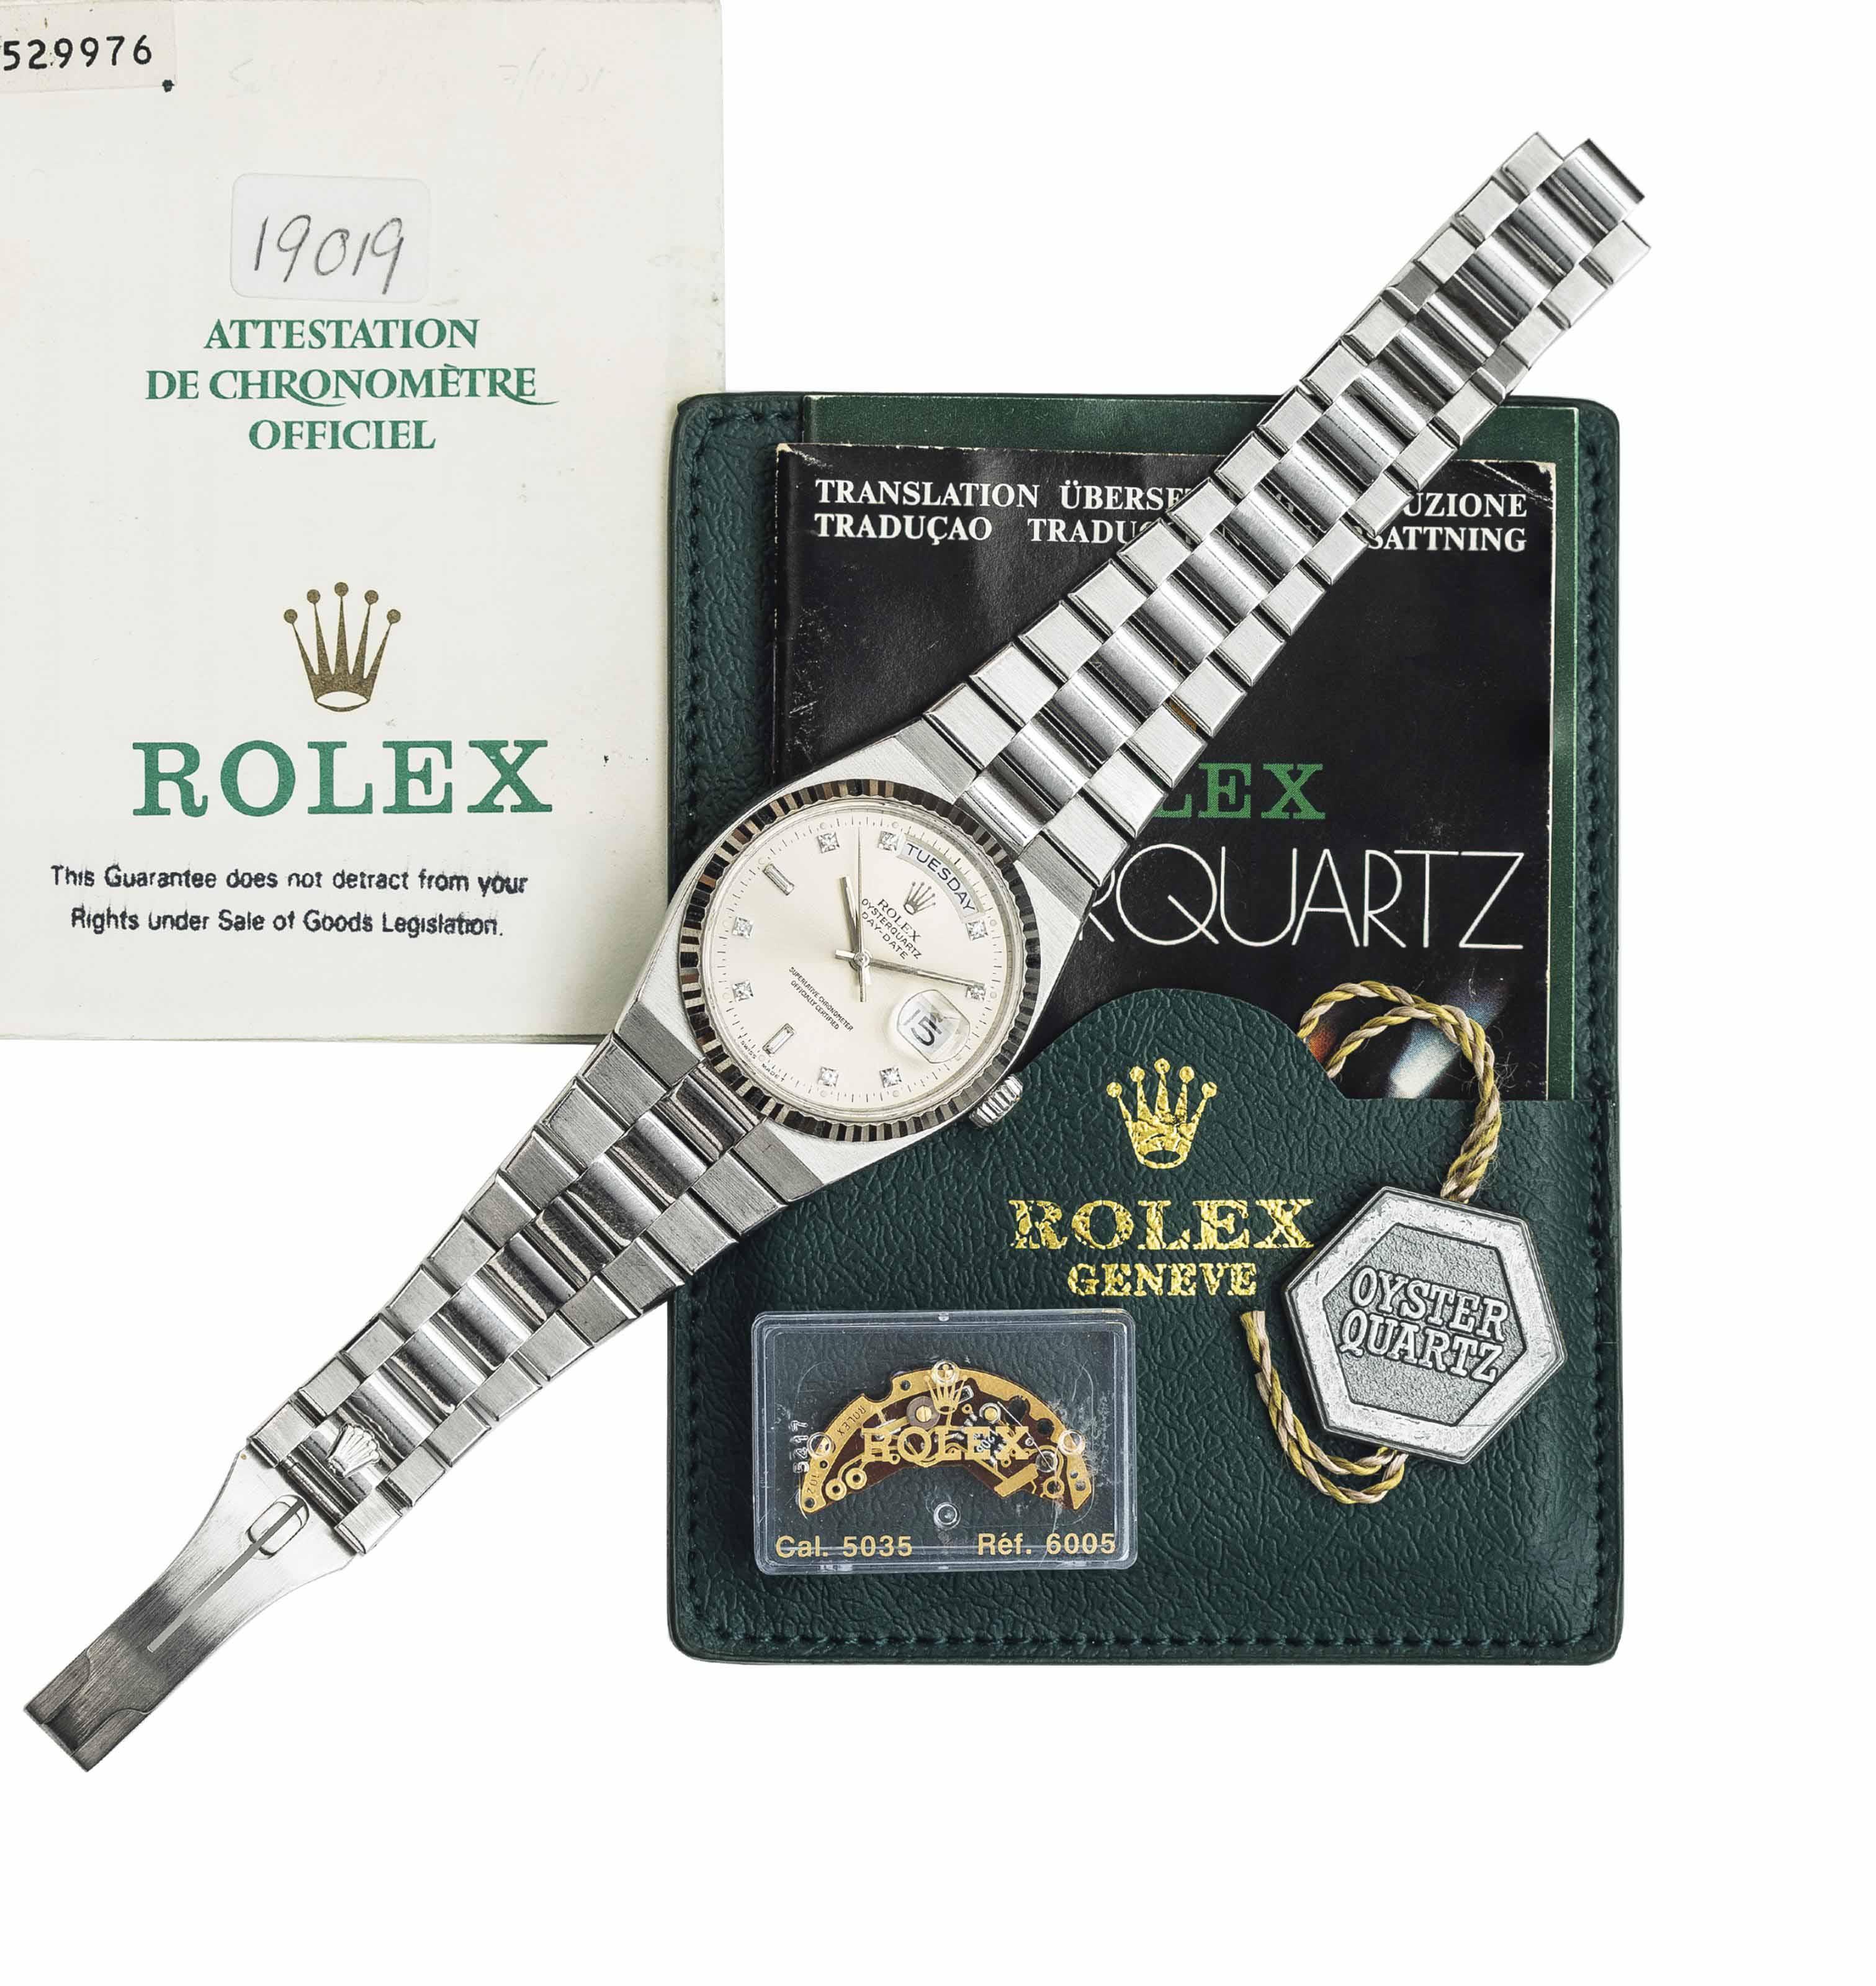 ROLEX. A VERY FINE 18K WHITE G